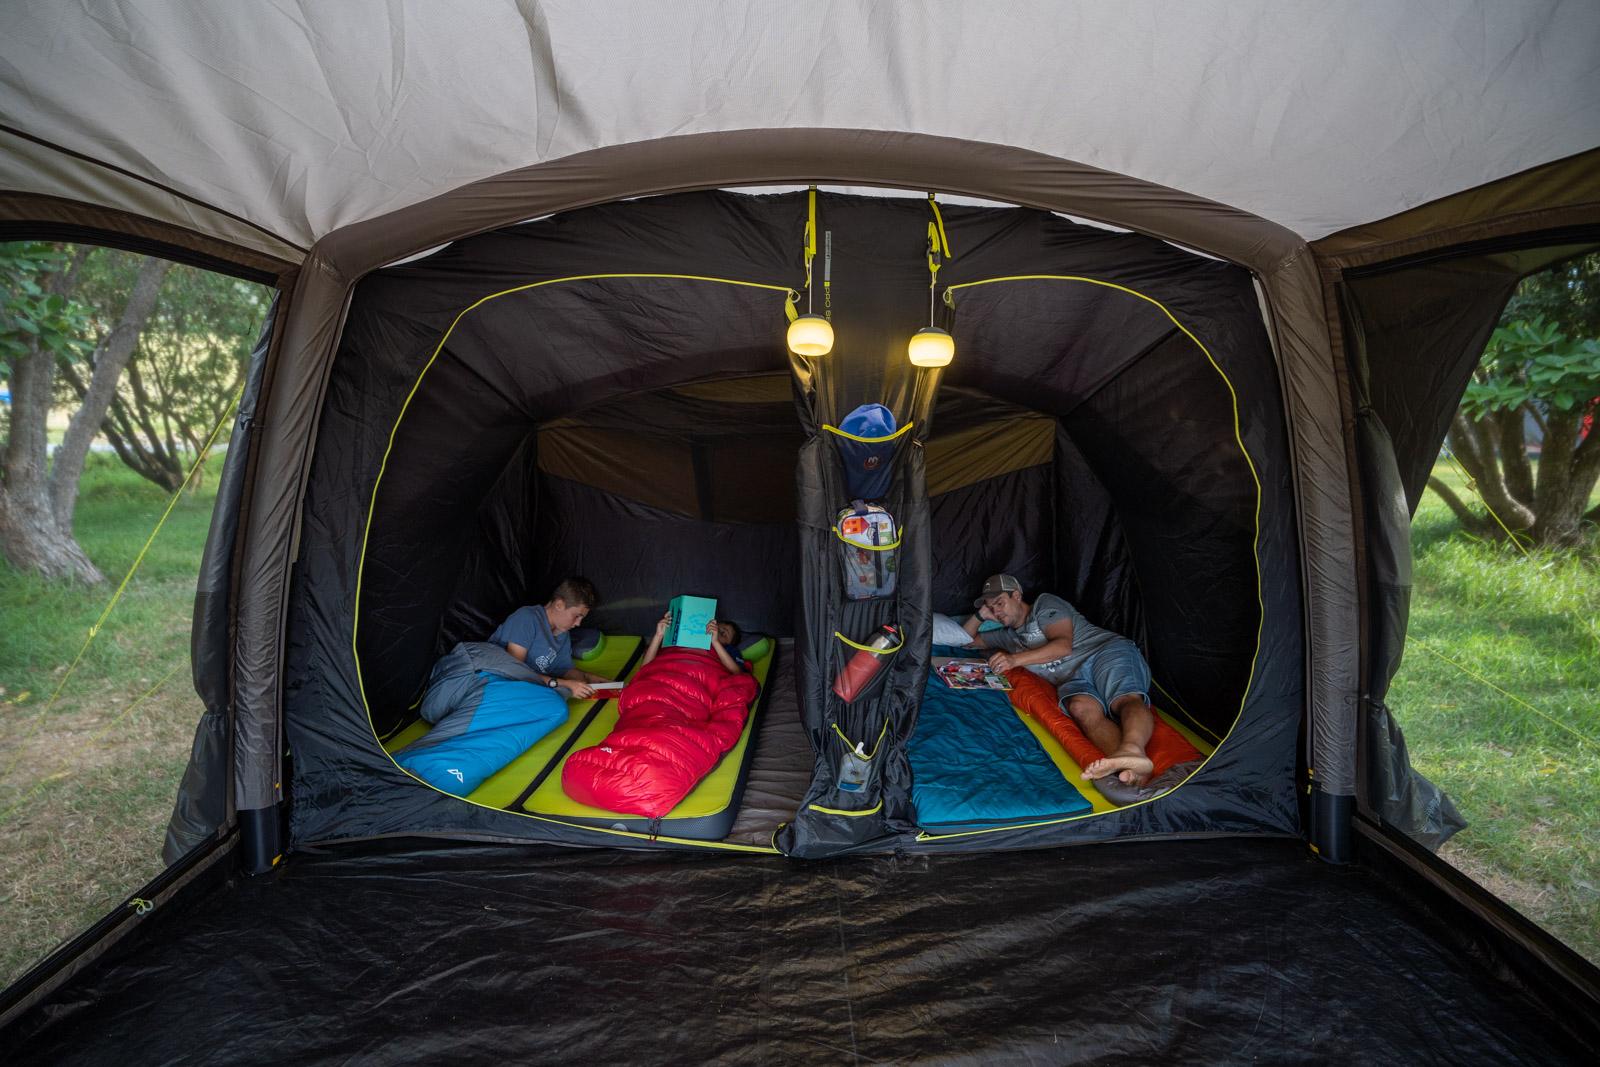 Zempire Monstamats Aero TL Pro tent